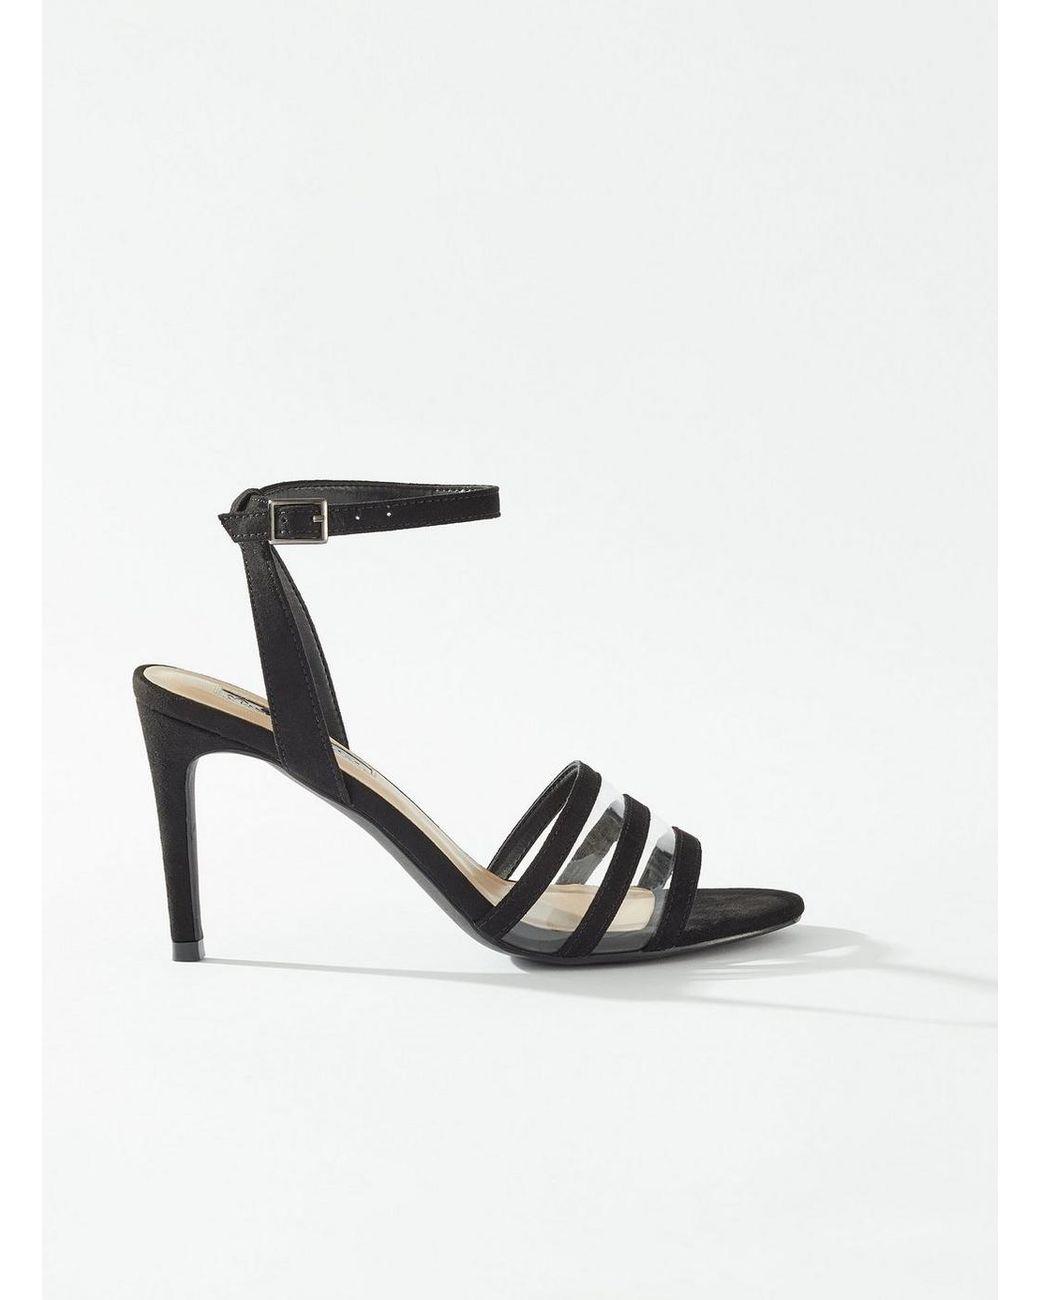 d742dbc7de2 Women's Sentara Black Perspex Heeled Sandals